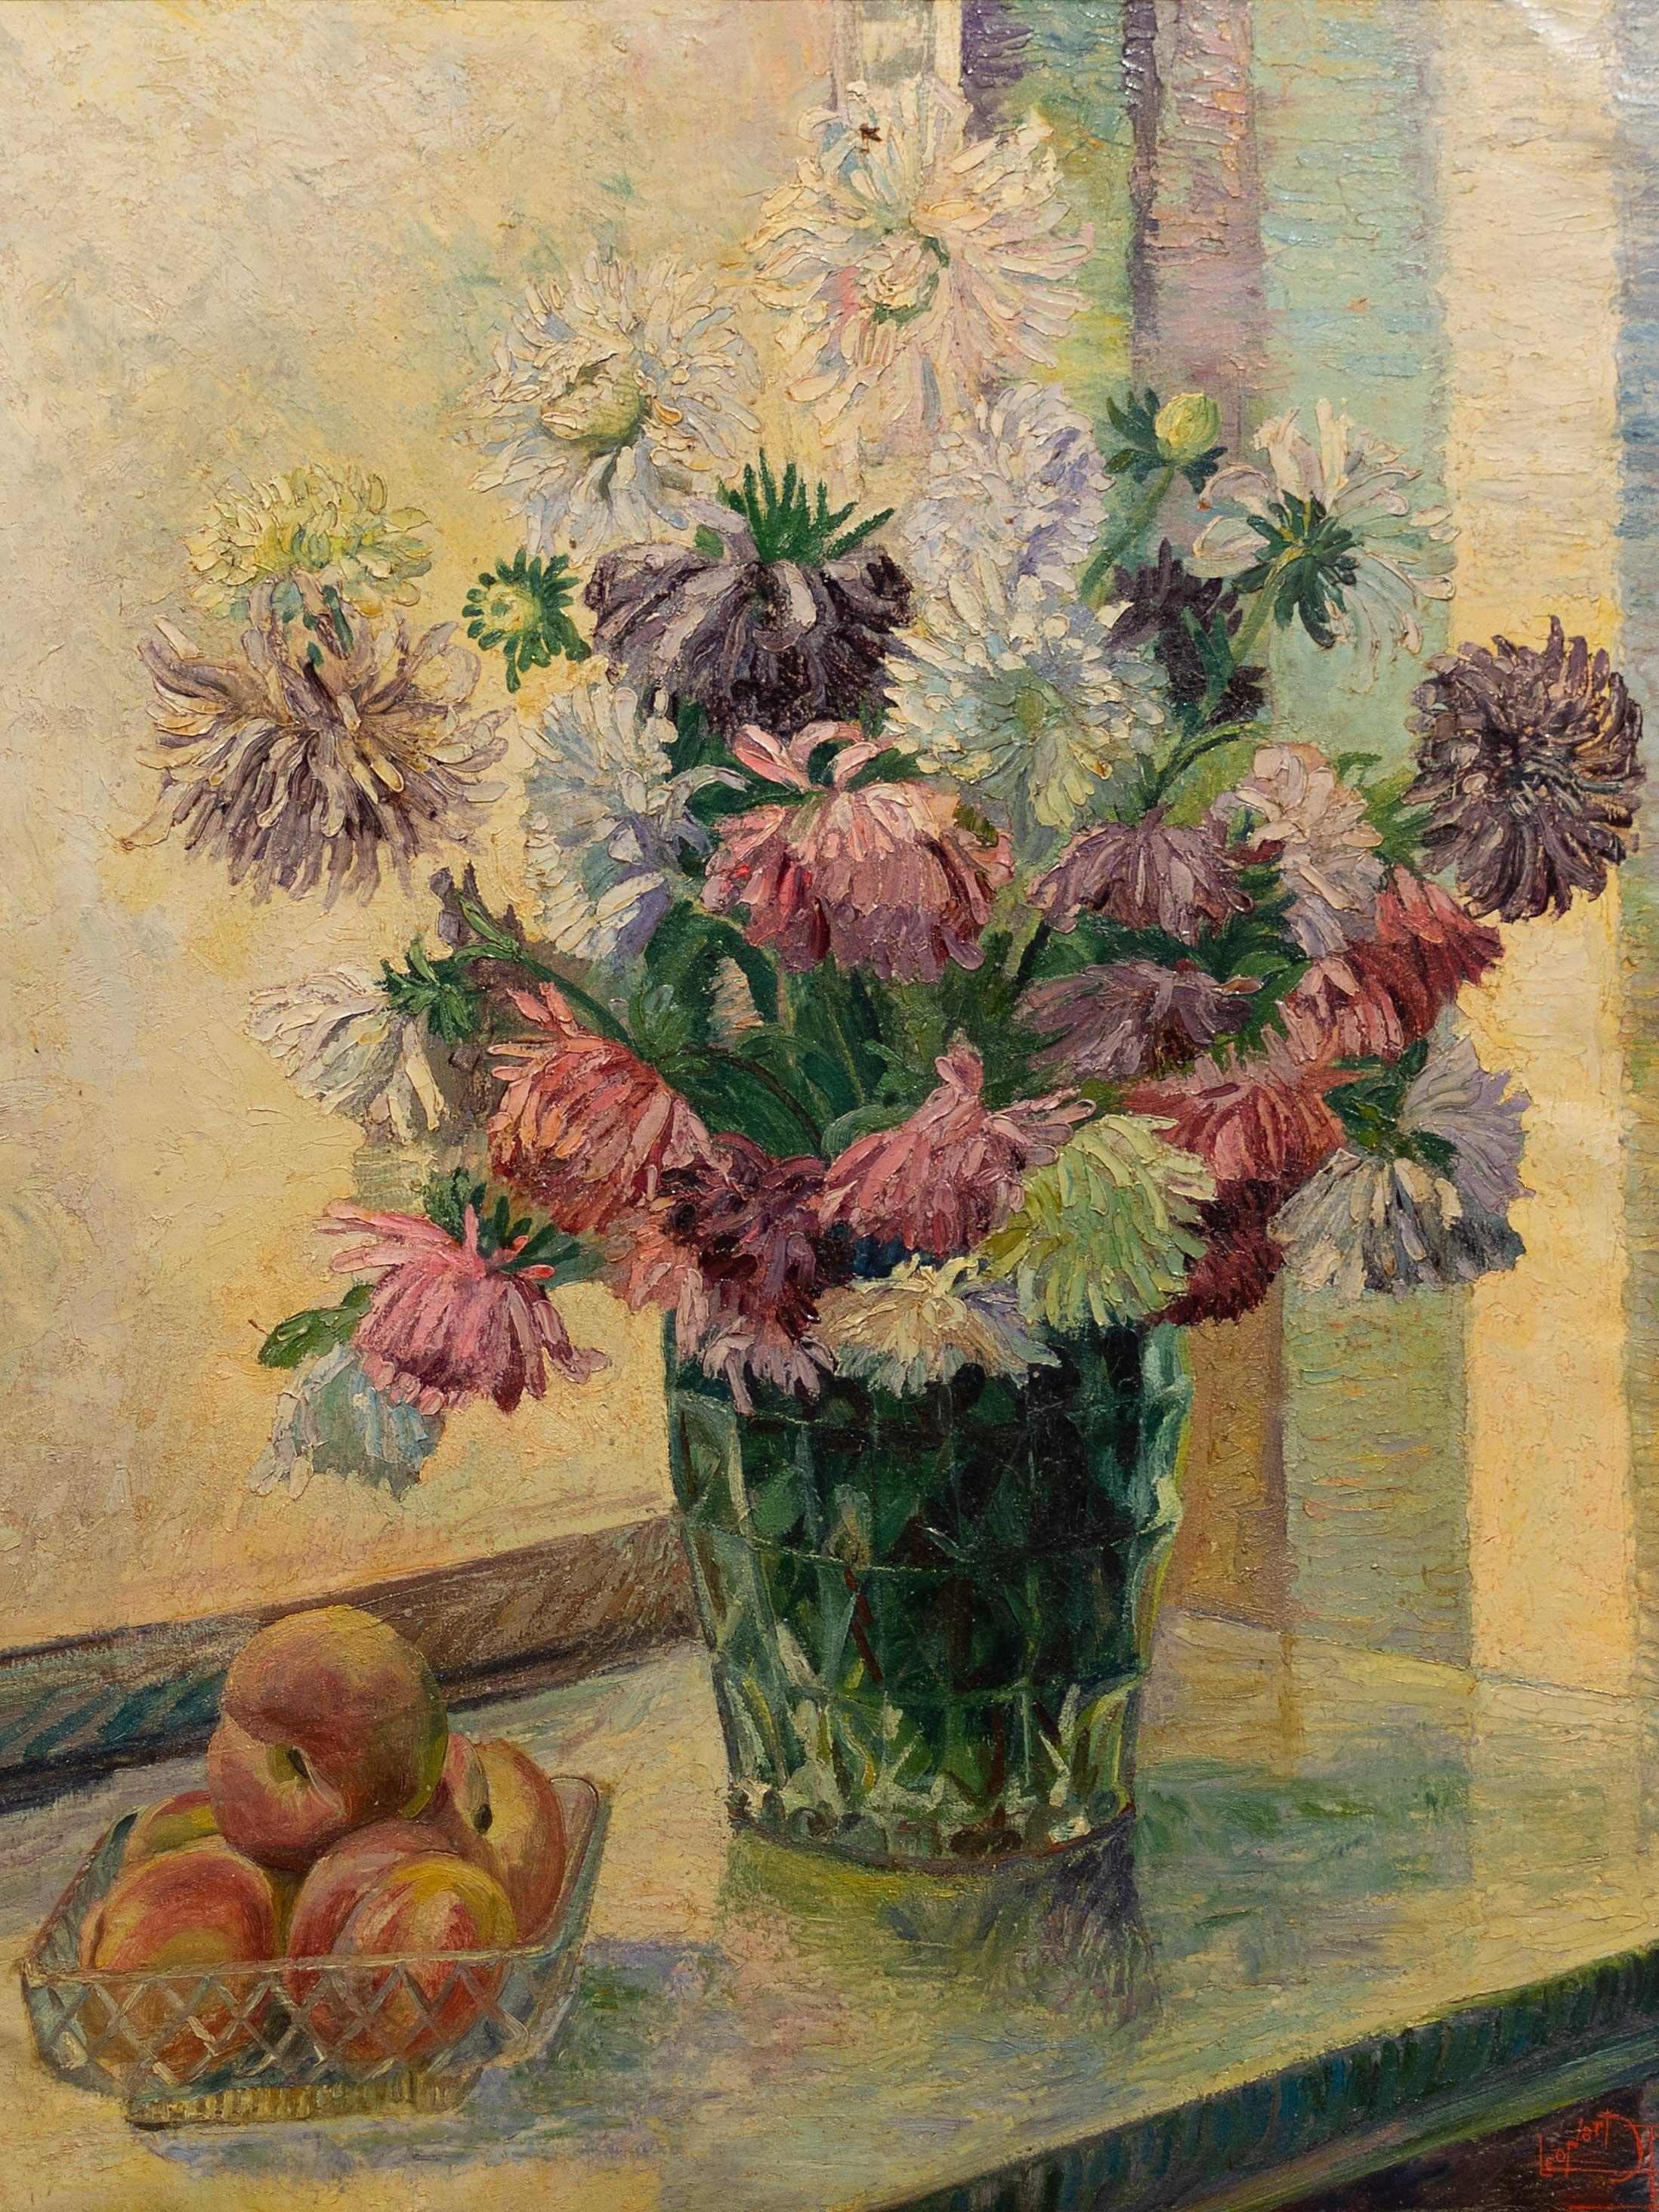 Léonard Pelgrims (Belgian 1894 - 1967) Oil, Still Life Flowers & Fruit, Signed, 60 x 50